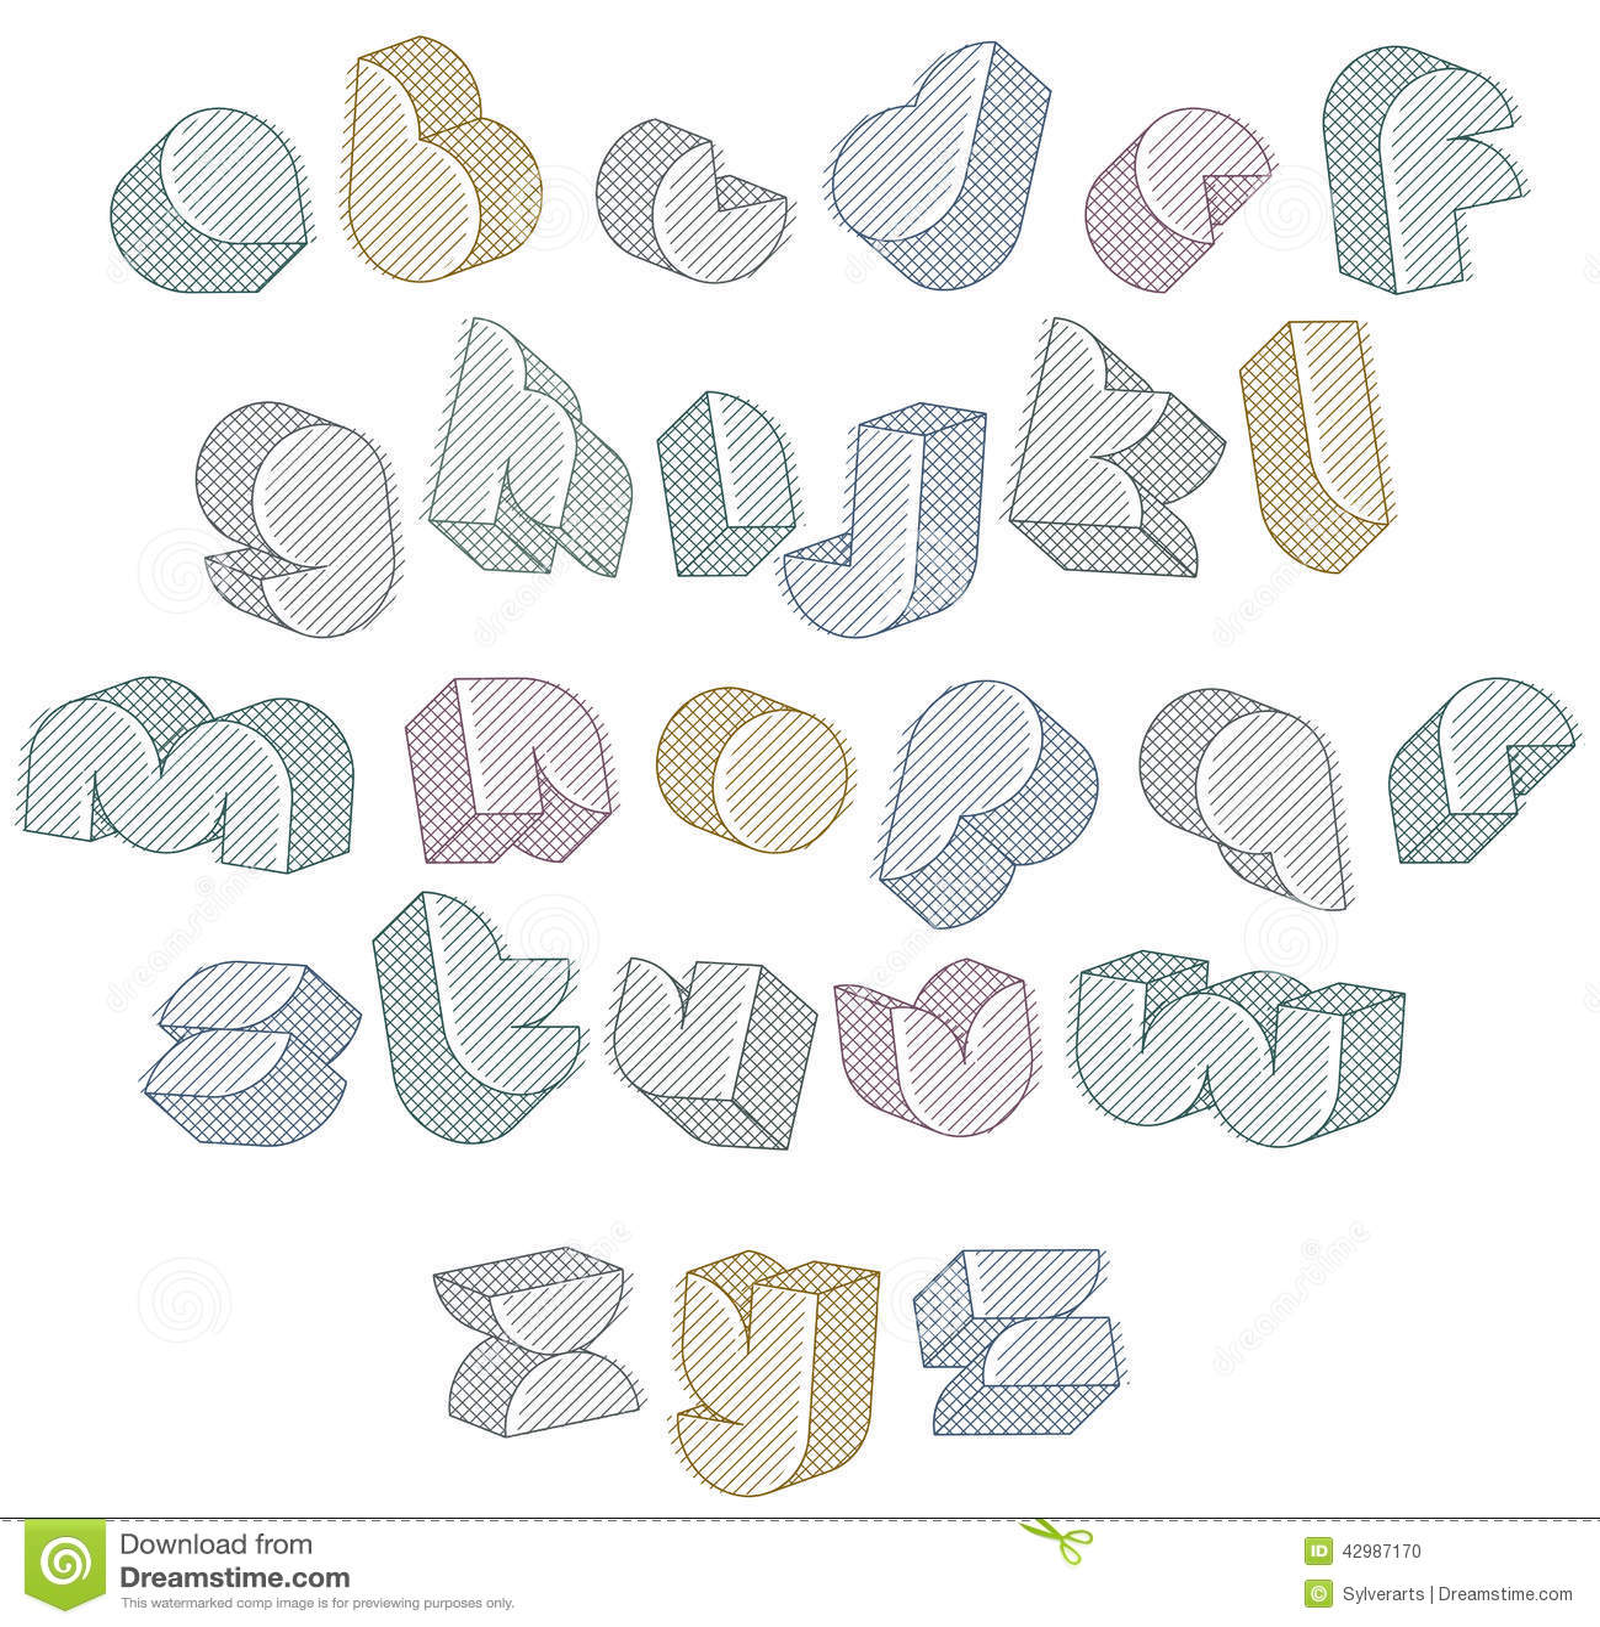 Circuit Symbol Font Ask Answer Wiring Diagram Schematic Symbols Romeolozada001 3d Futuristic With Lines Textures Cartoon Vector Cartoondealer Com 43599655 For Fuse